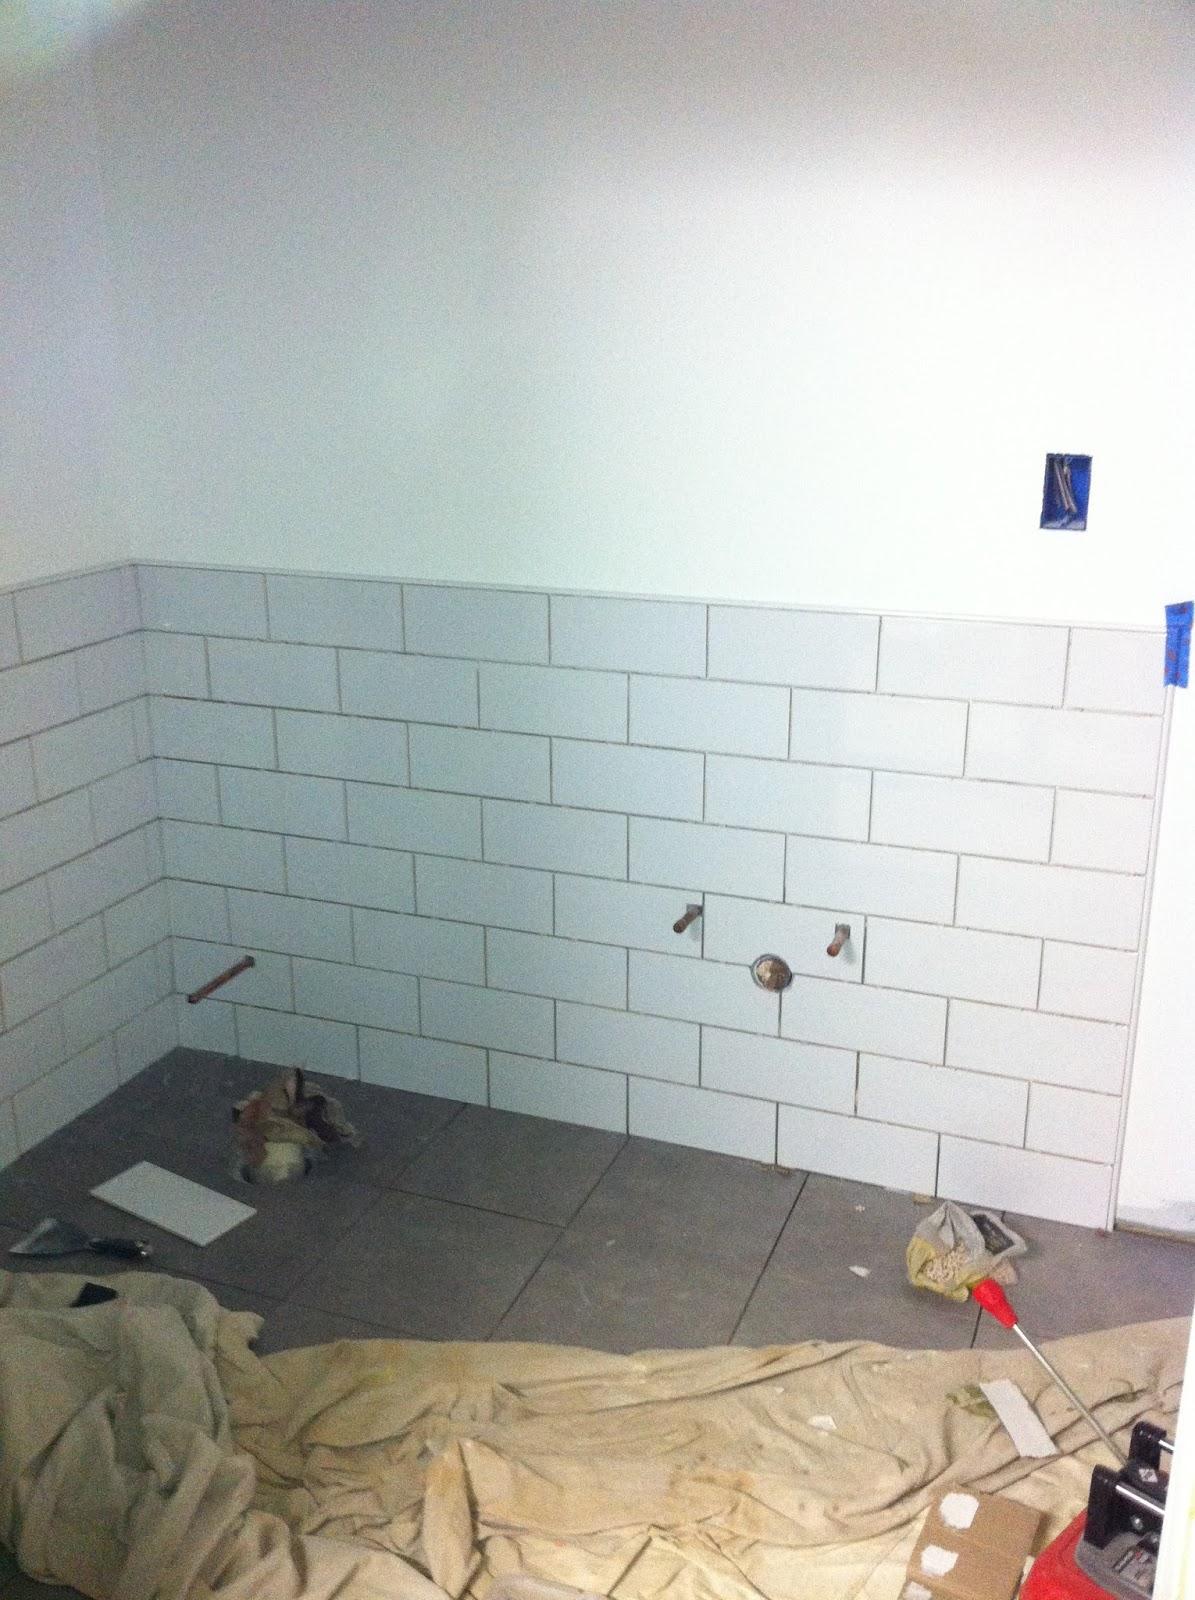 4 X 8 Subway Tile Revolutionhr